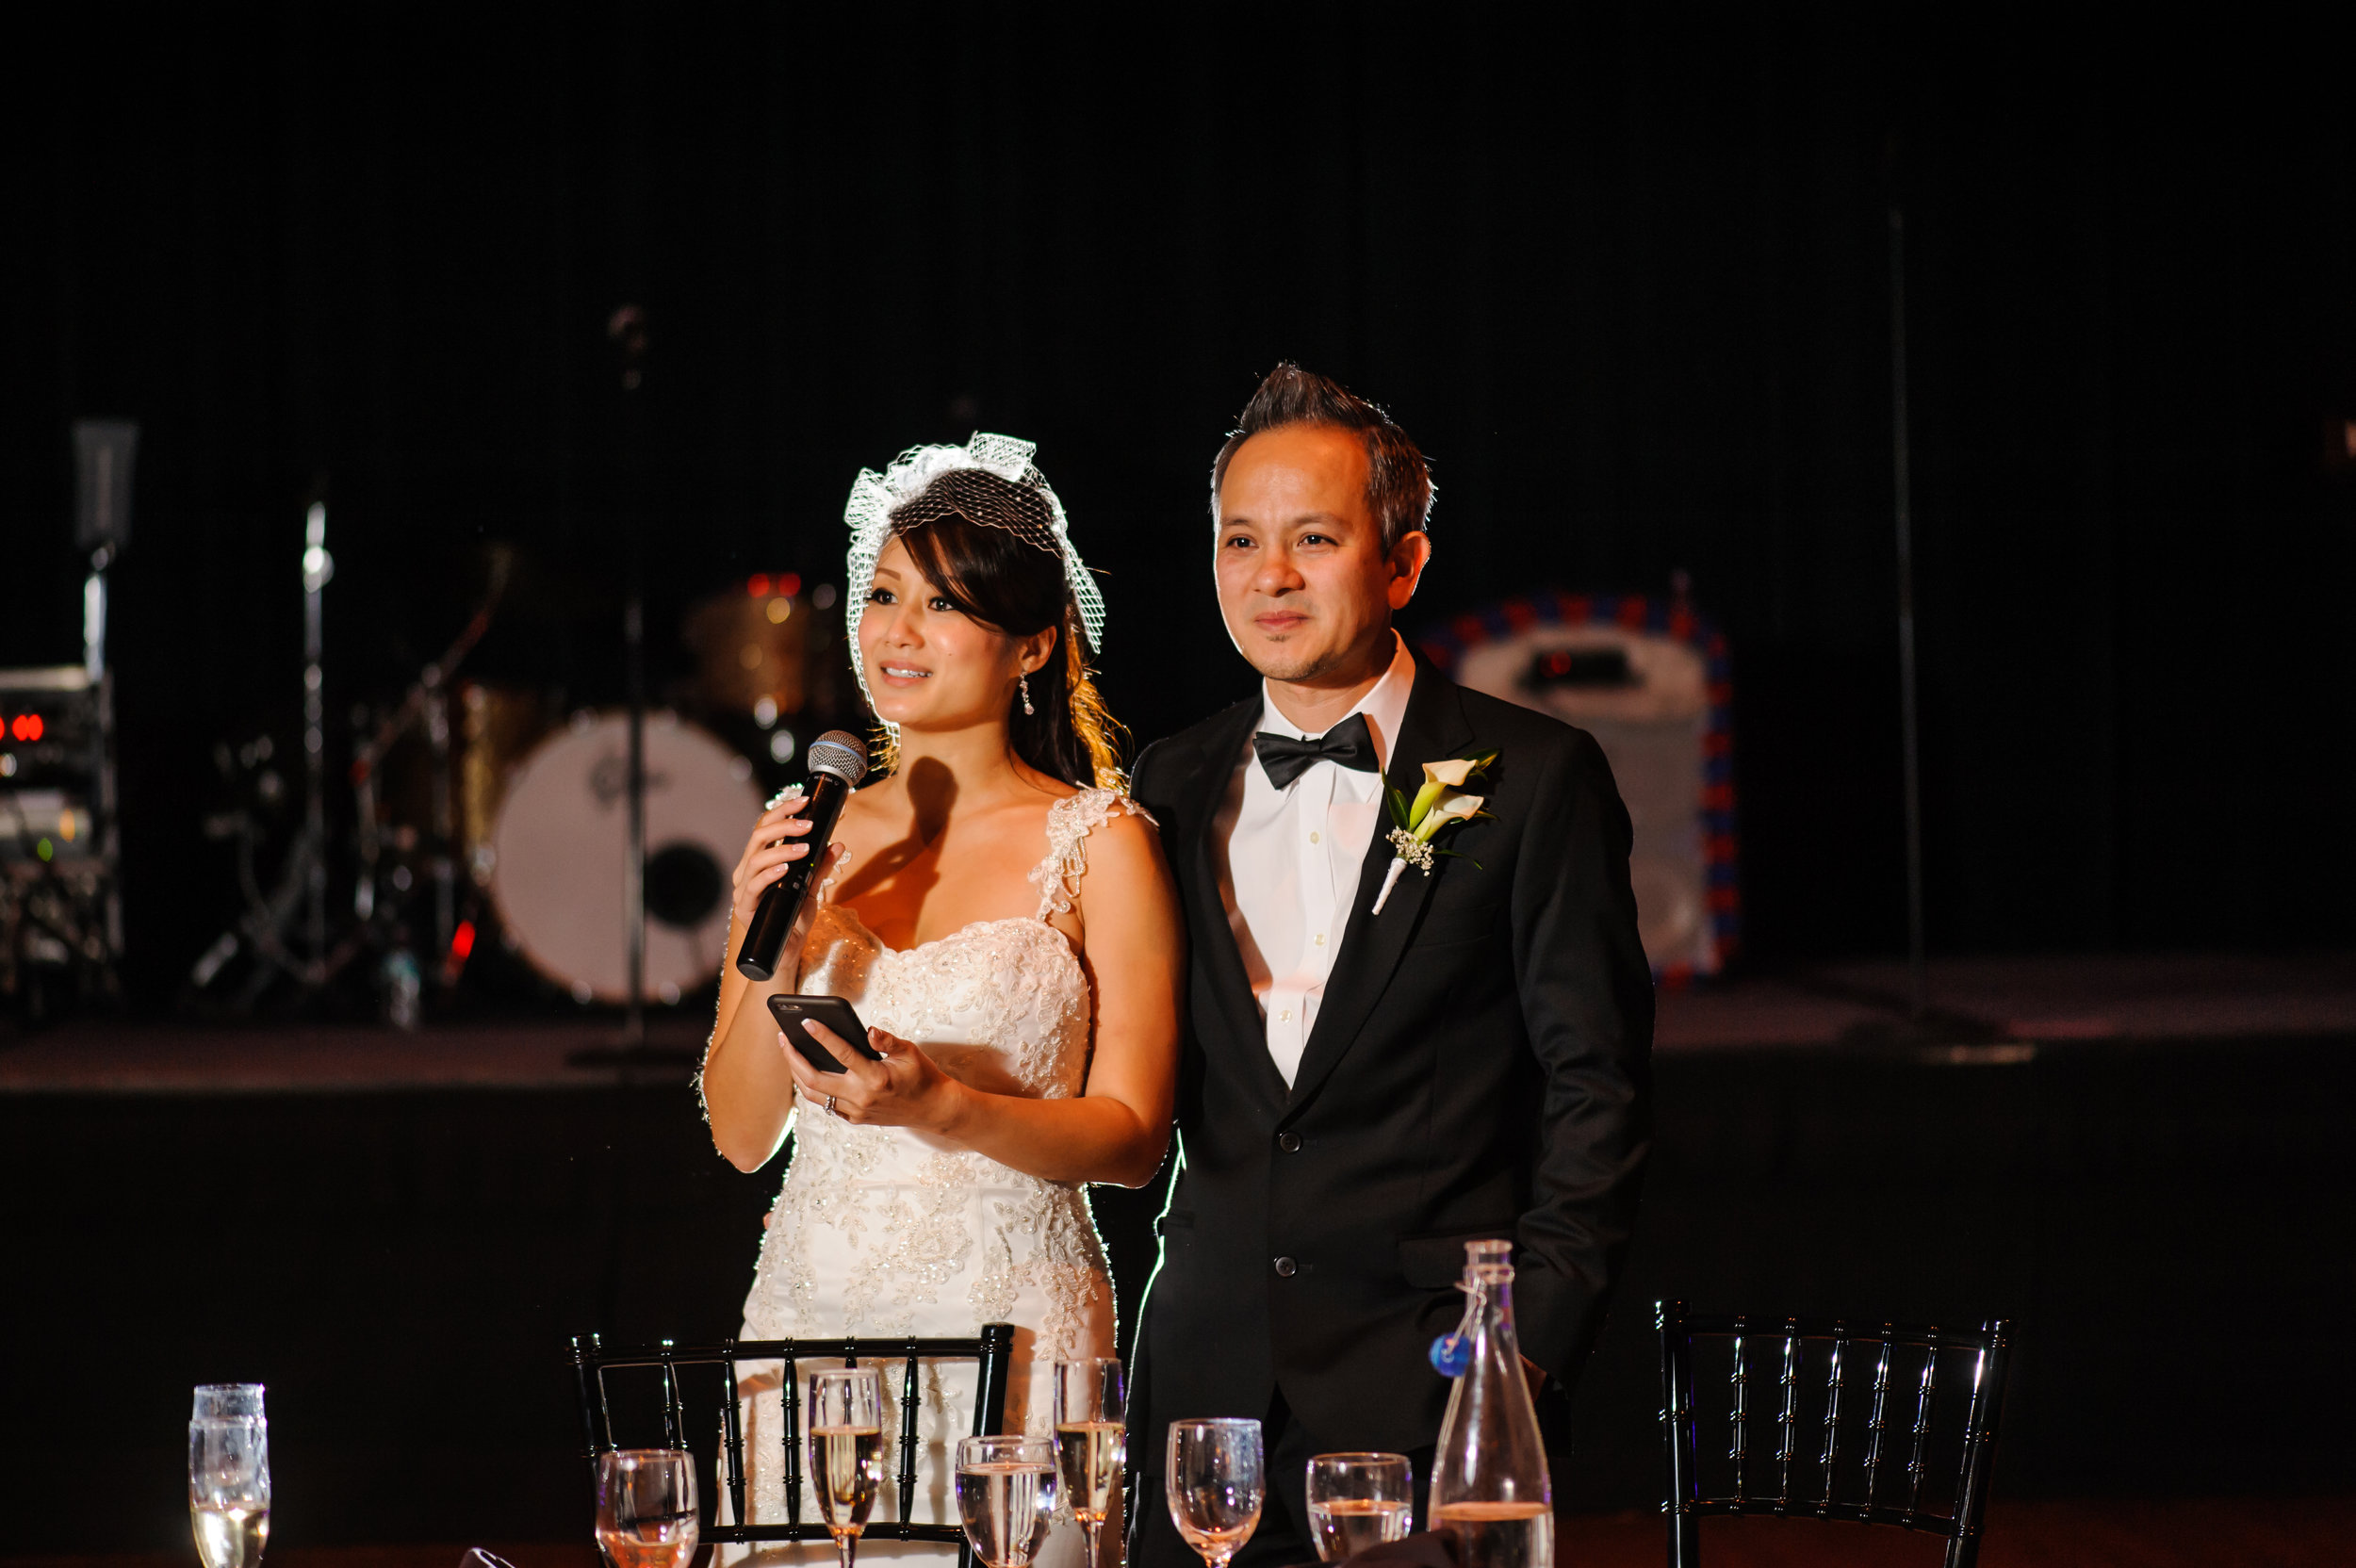 camilla-thuy-059-memorial-auditorium-sacramento-wedding-photographer-katherine-nicole-photography.JPG